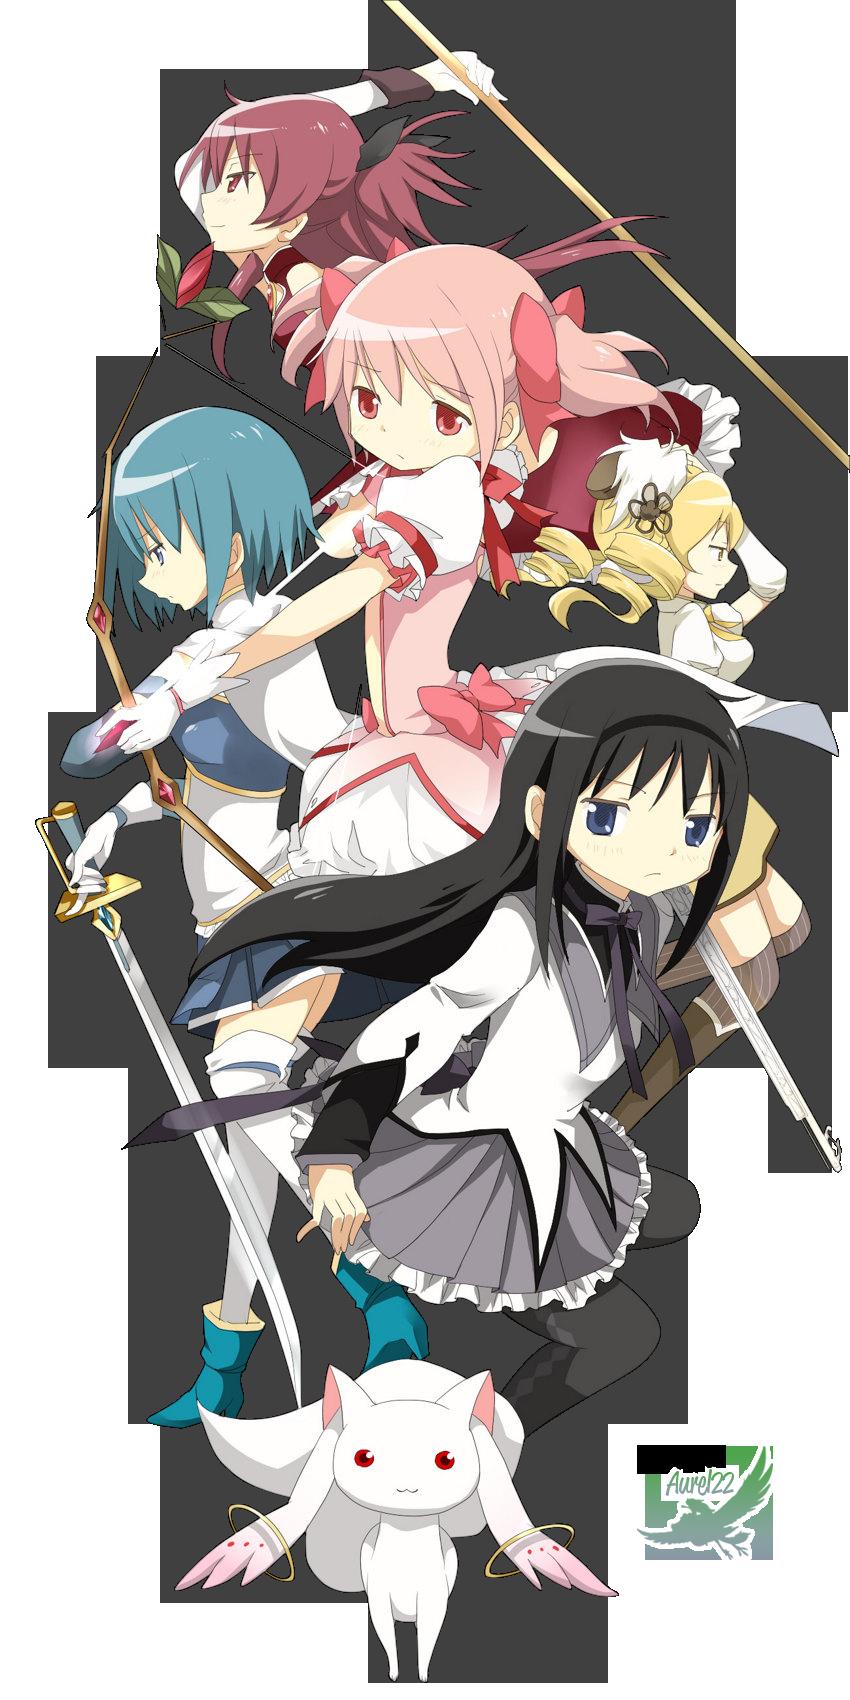 Puella Magi Madoka Magica Group 2 Render By Anouet Deviantart Com On Deviantart Mahō Shōjo Madoka Magica Puella Magi Madoka Magica Anime